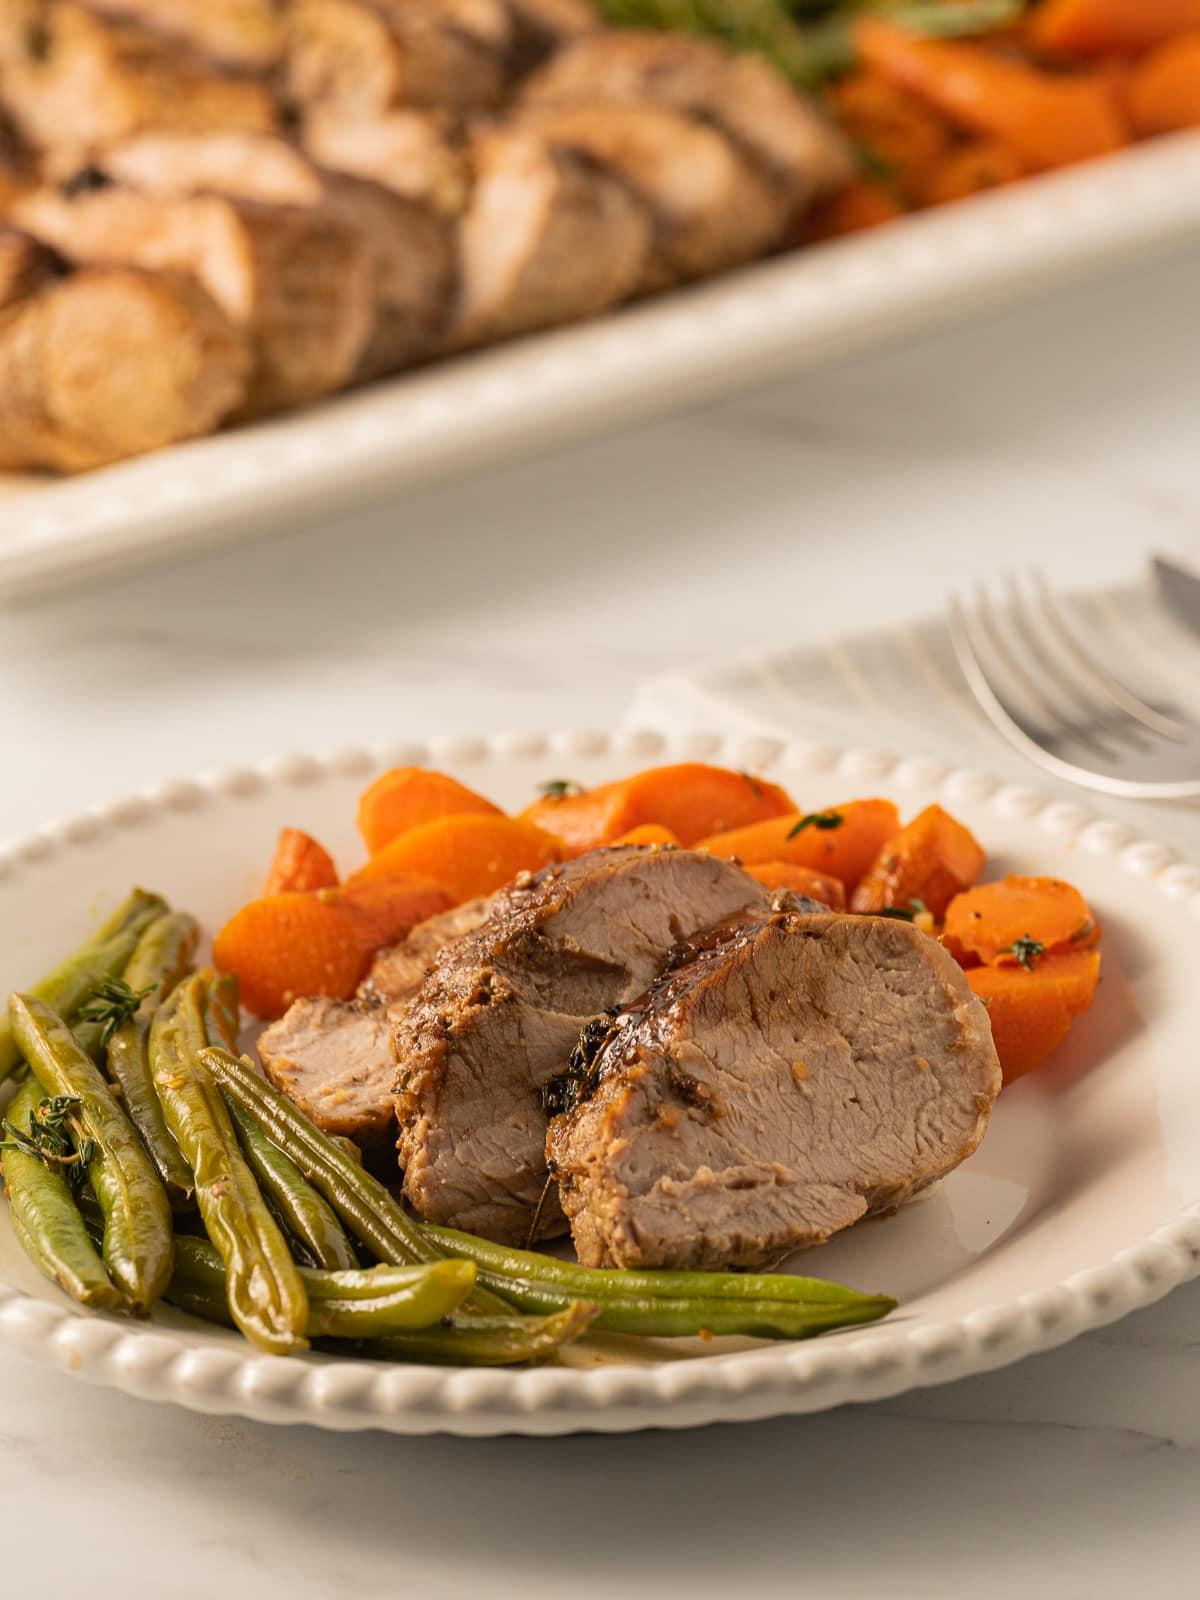 keto pork tenderloin on white plate with carrots and string beans